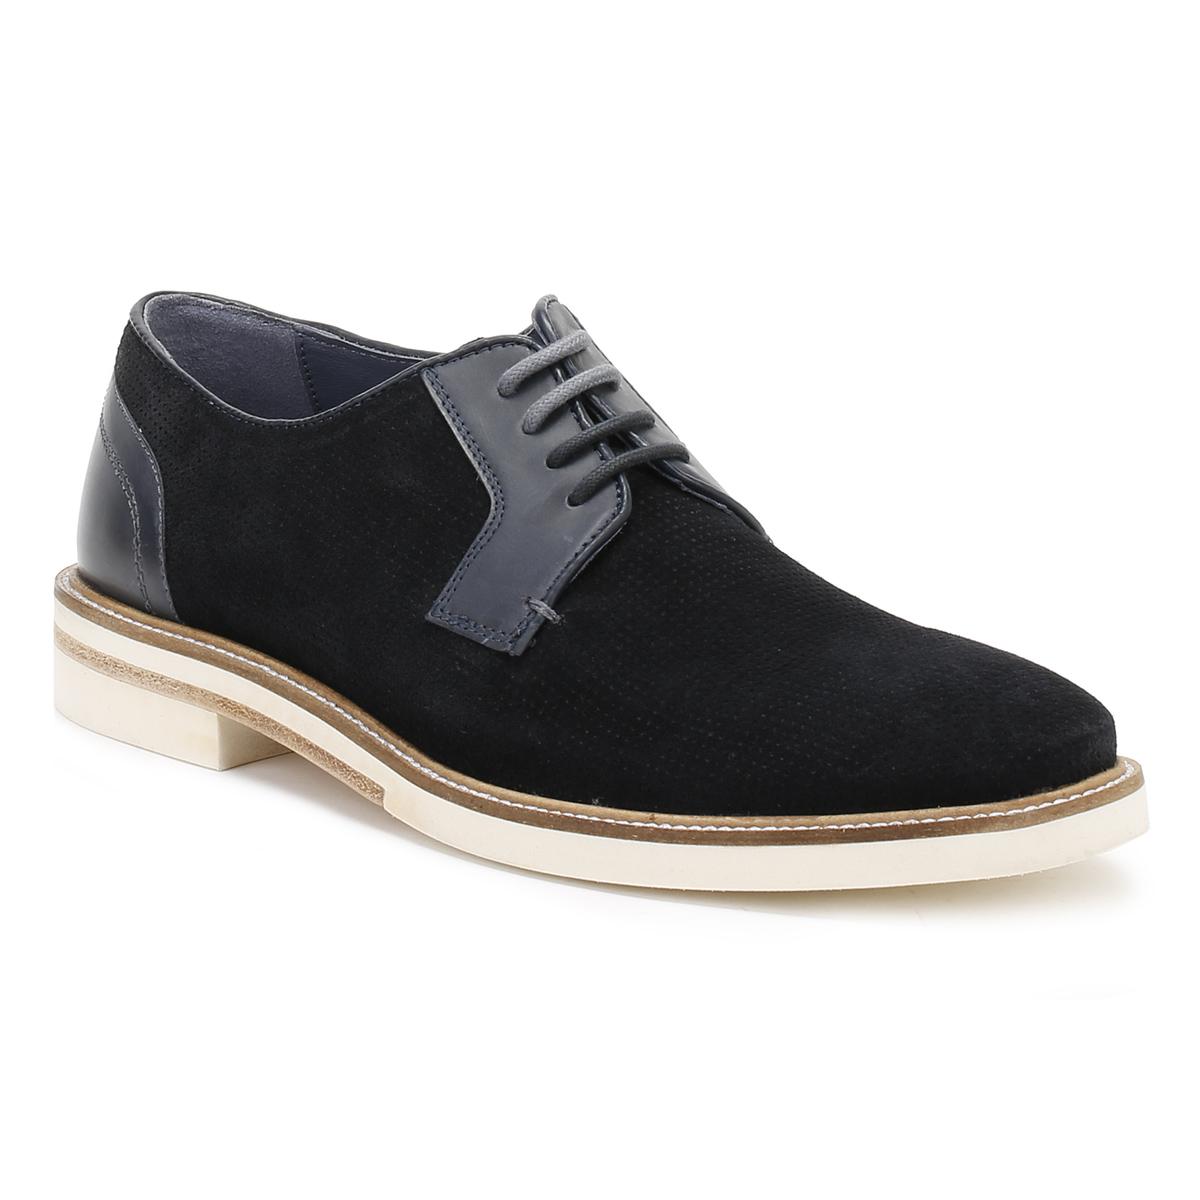 Ted Baker   Blau Herren Dark Blau  Siablo Derby Schuhes, Perforated Suede, Contrast Sole db4588